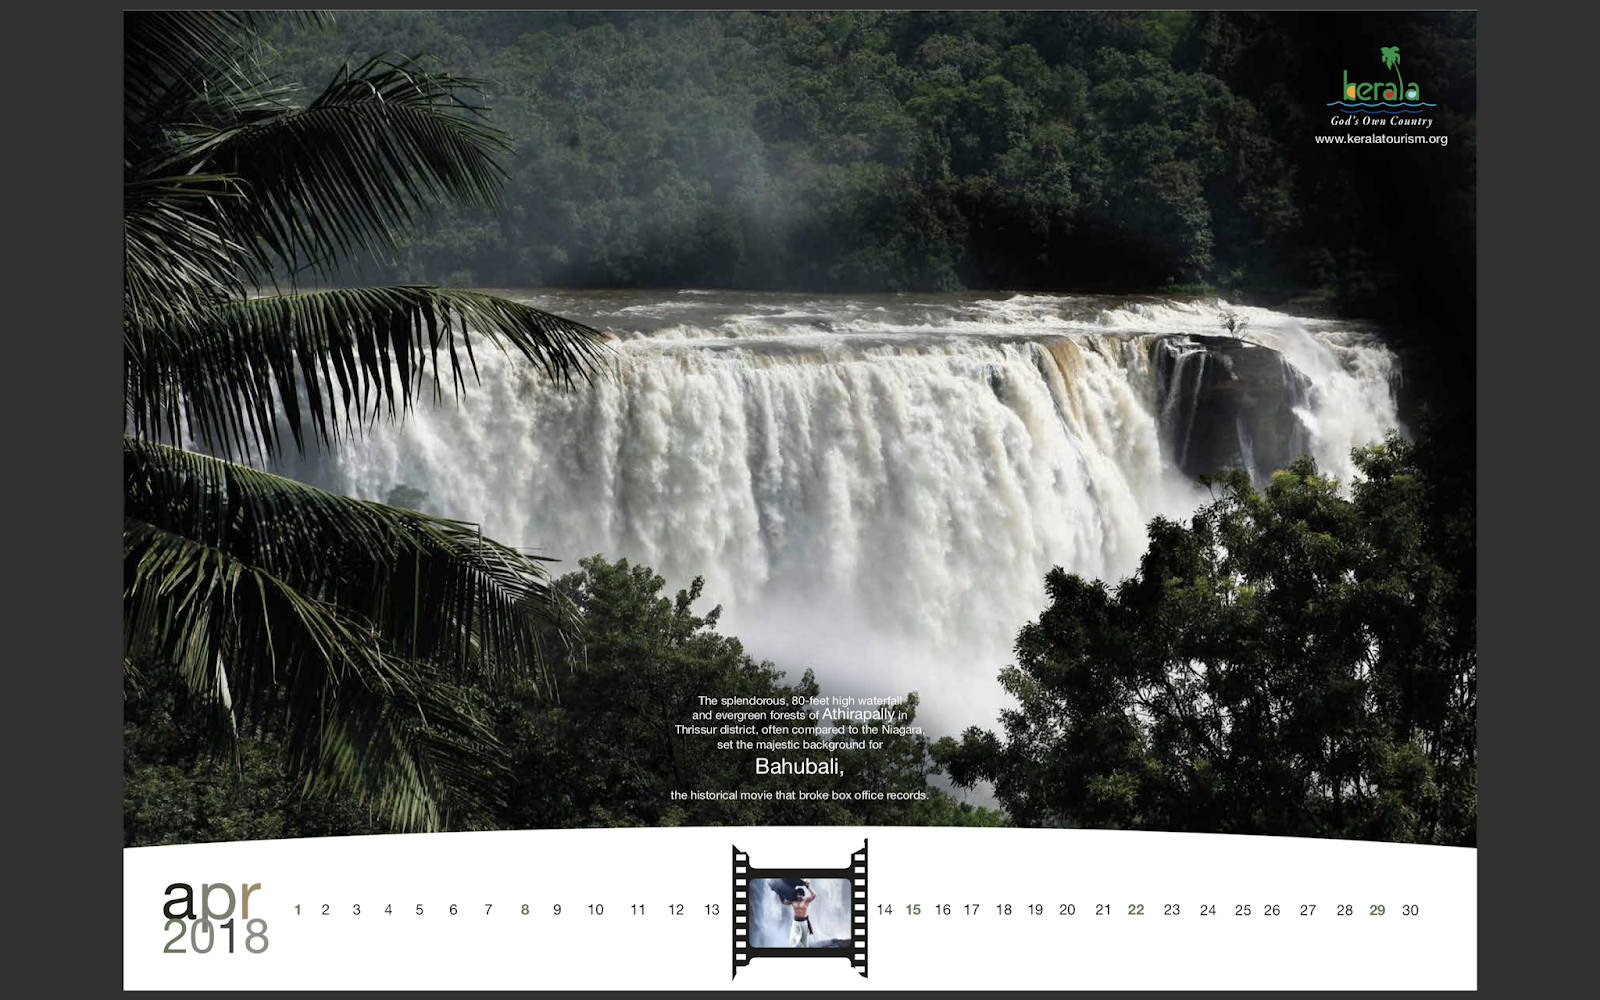 Kerala Tourism 2018 Calendar mock-up 5 | Stark Communications Pvt Ltd